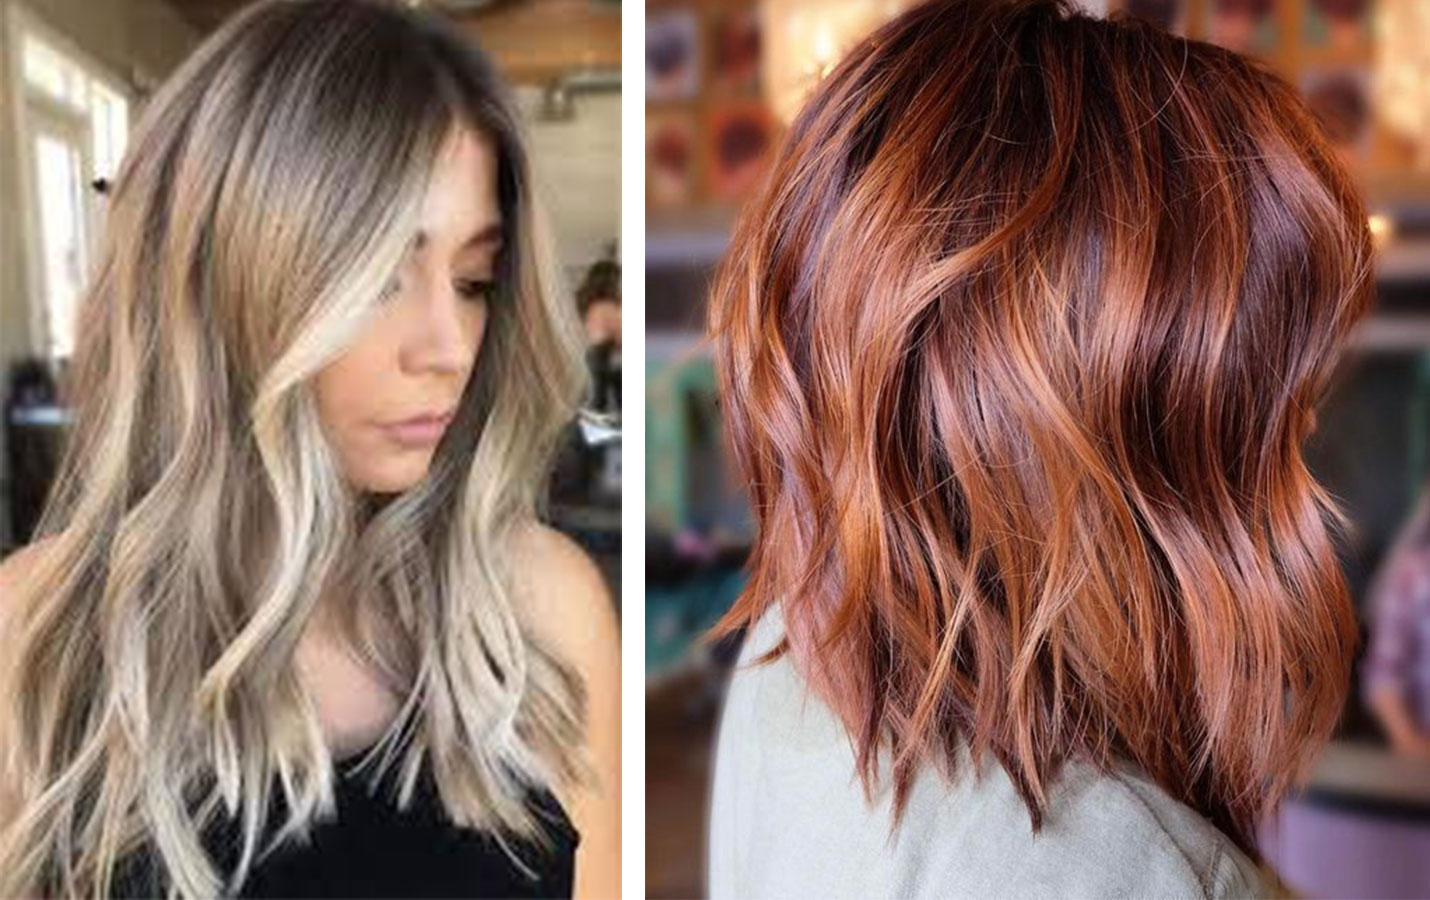 Frisurentrends 2019 Simonas Hairstyling